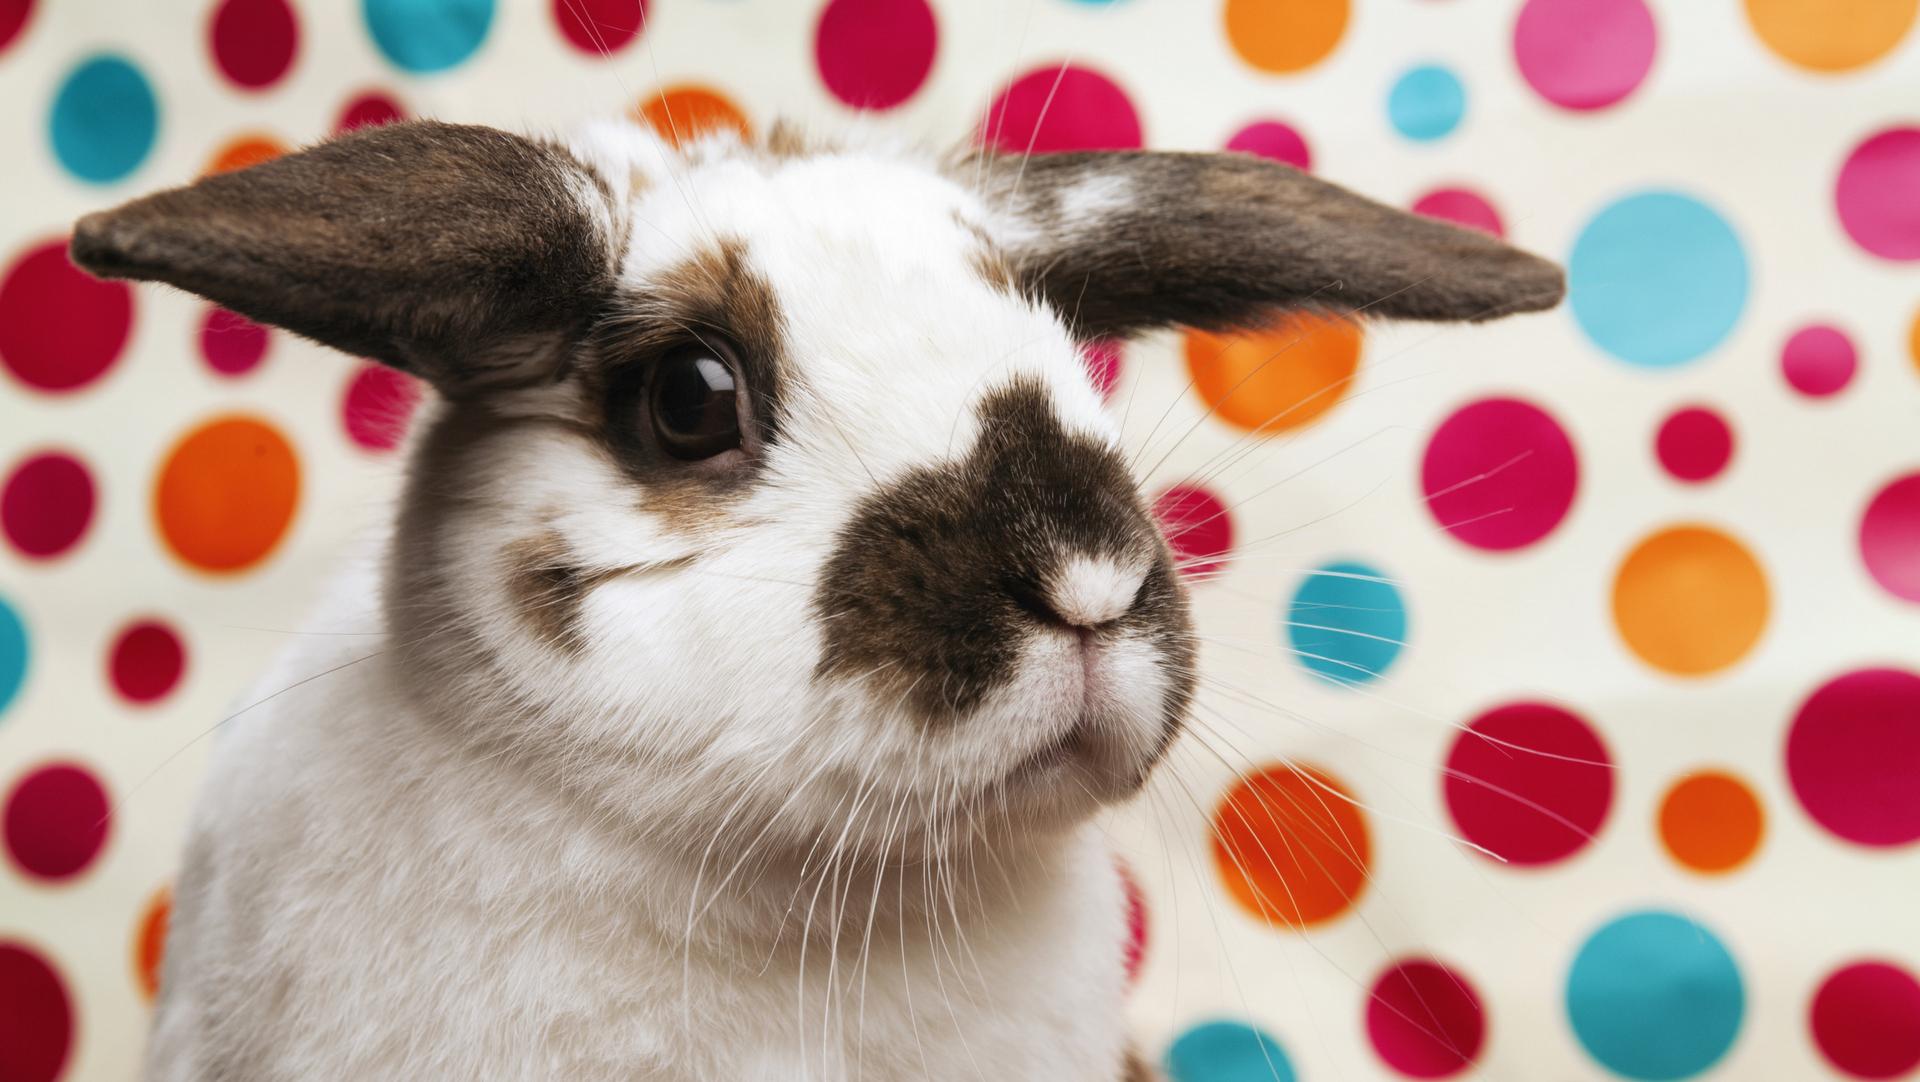 Baby named Bunny